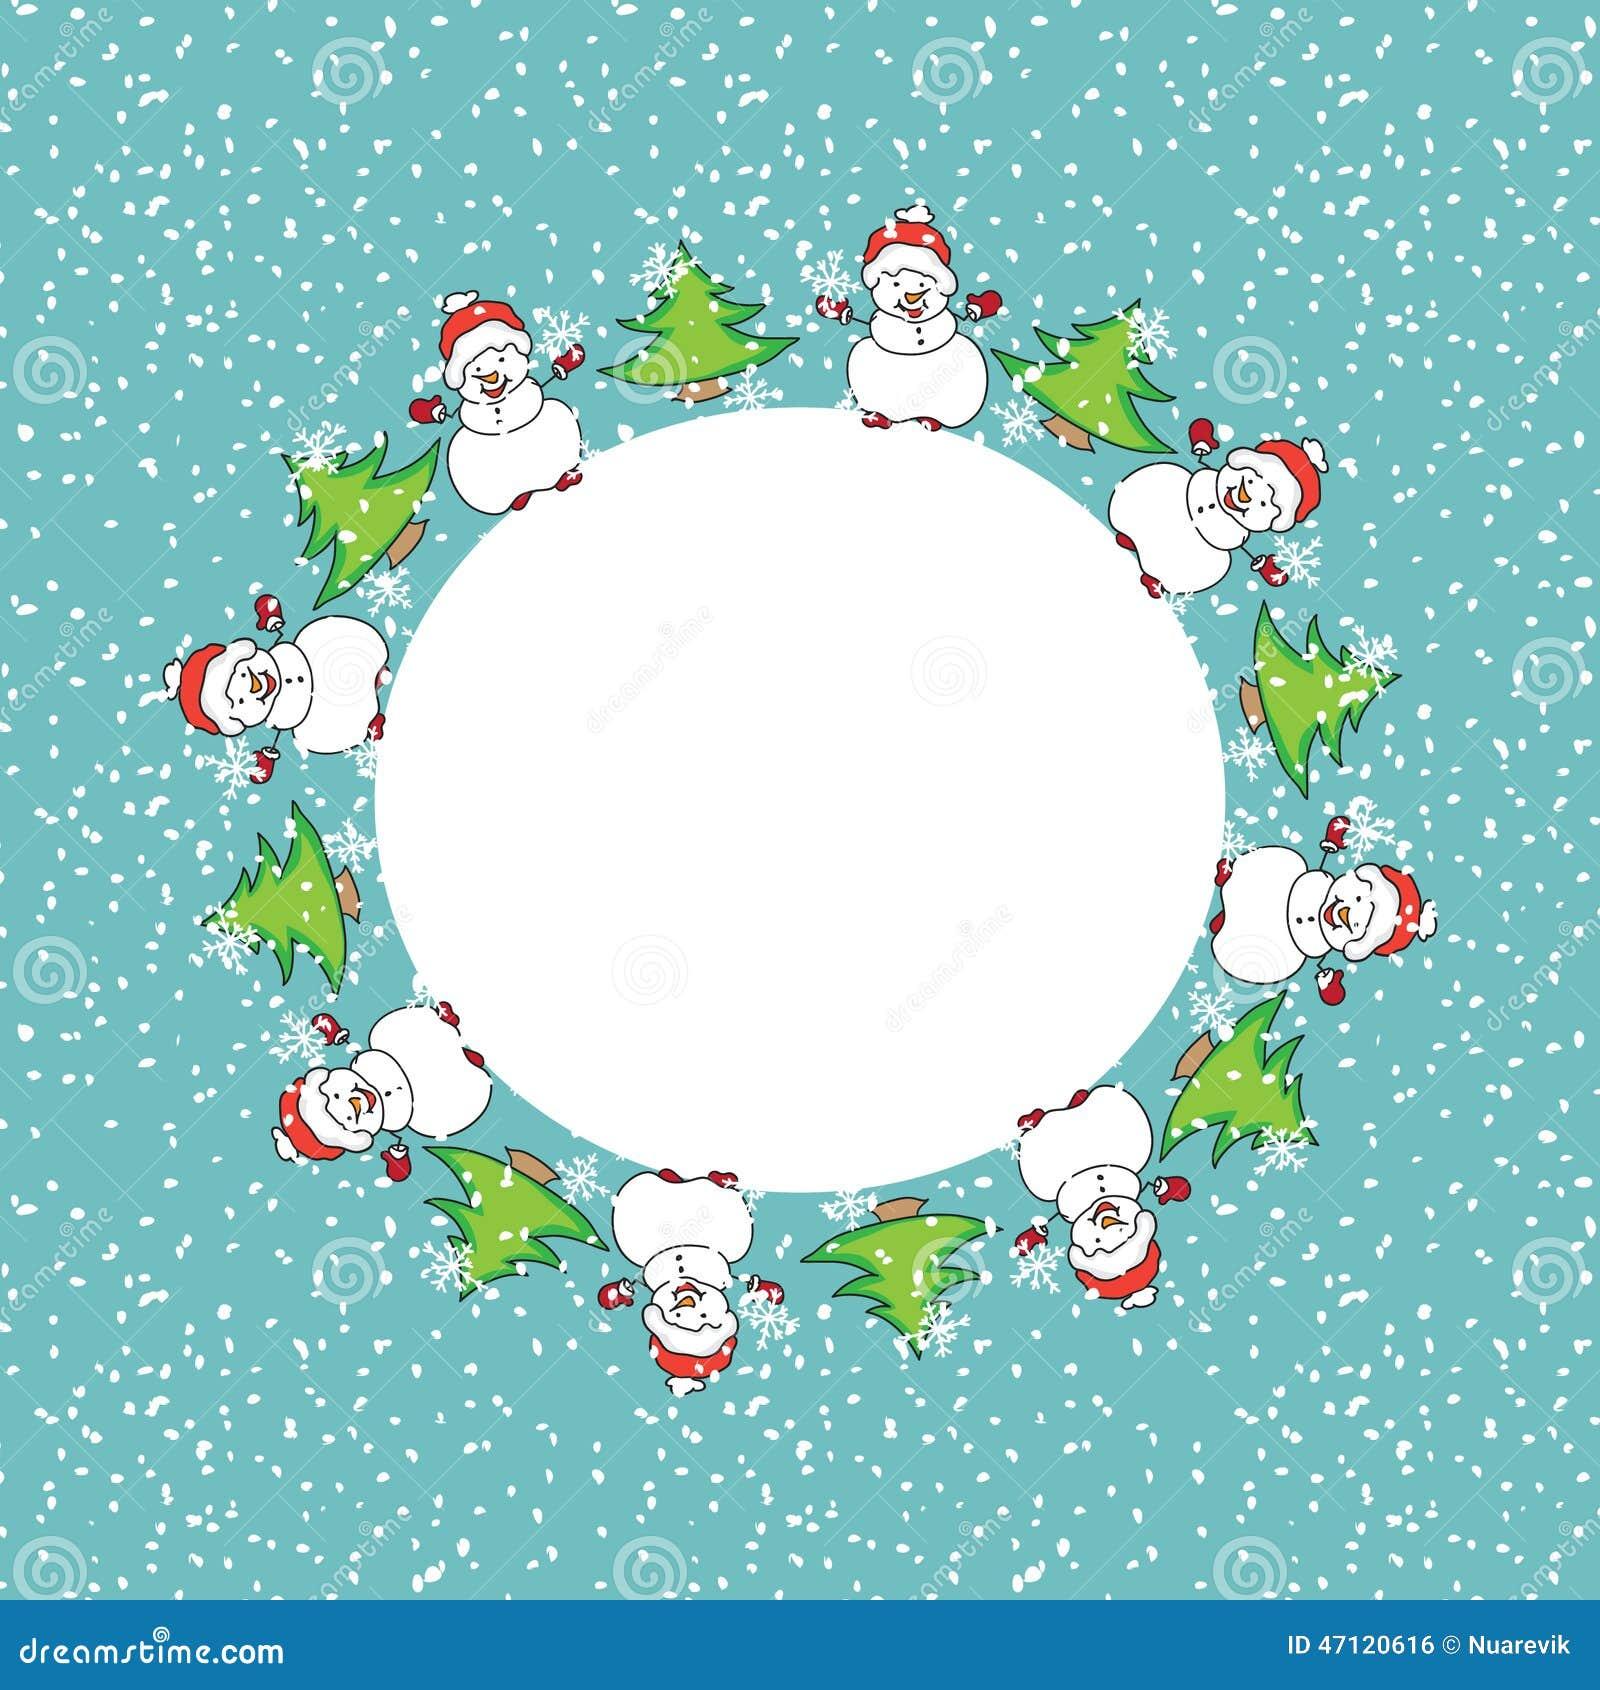 Doc570568 Christmas Card Templates for Word Christmas Card – Christmas Card Word Template